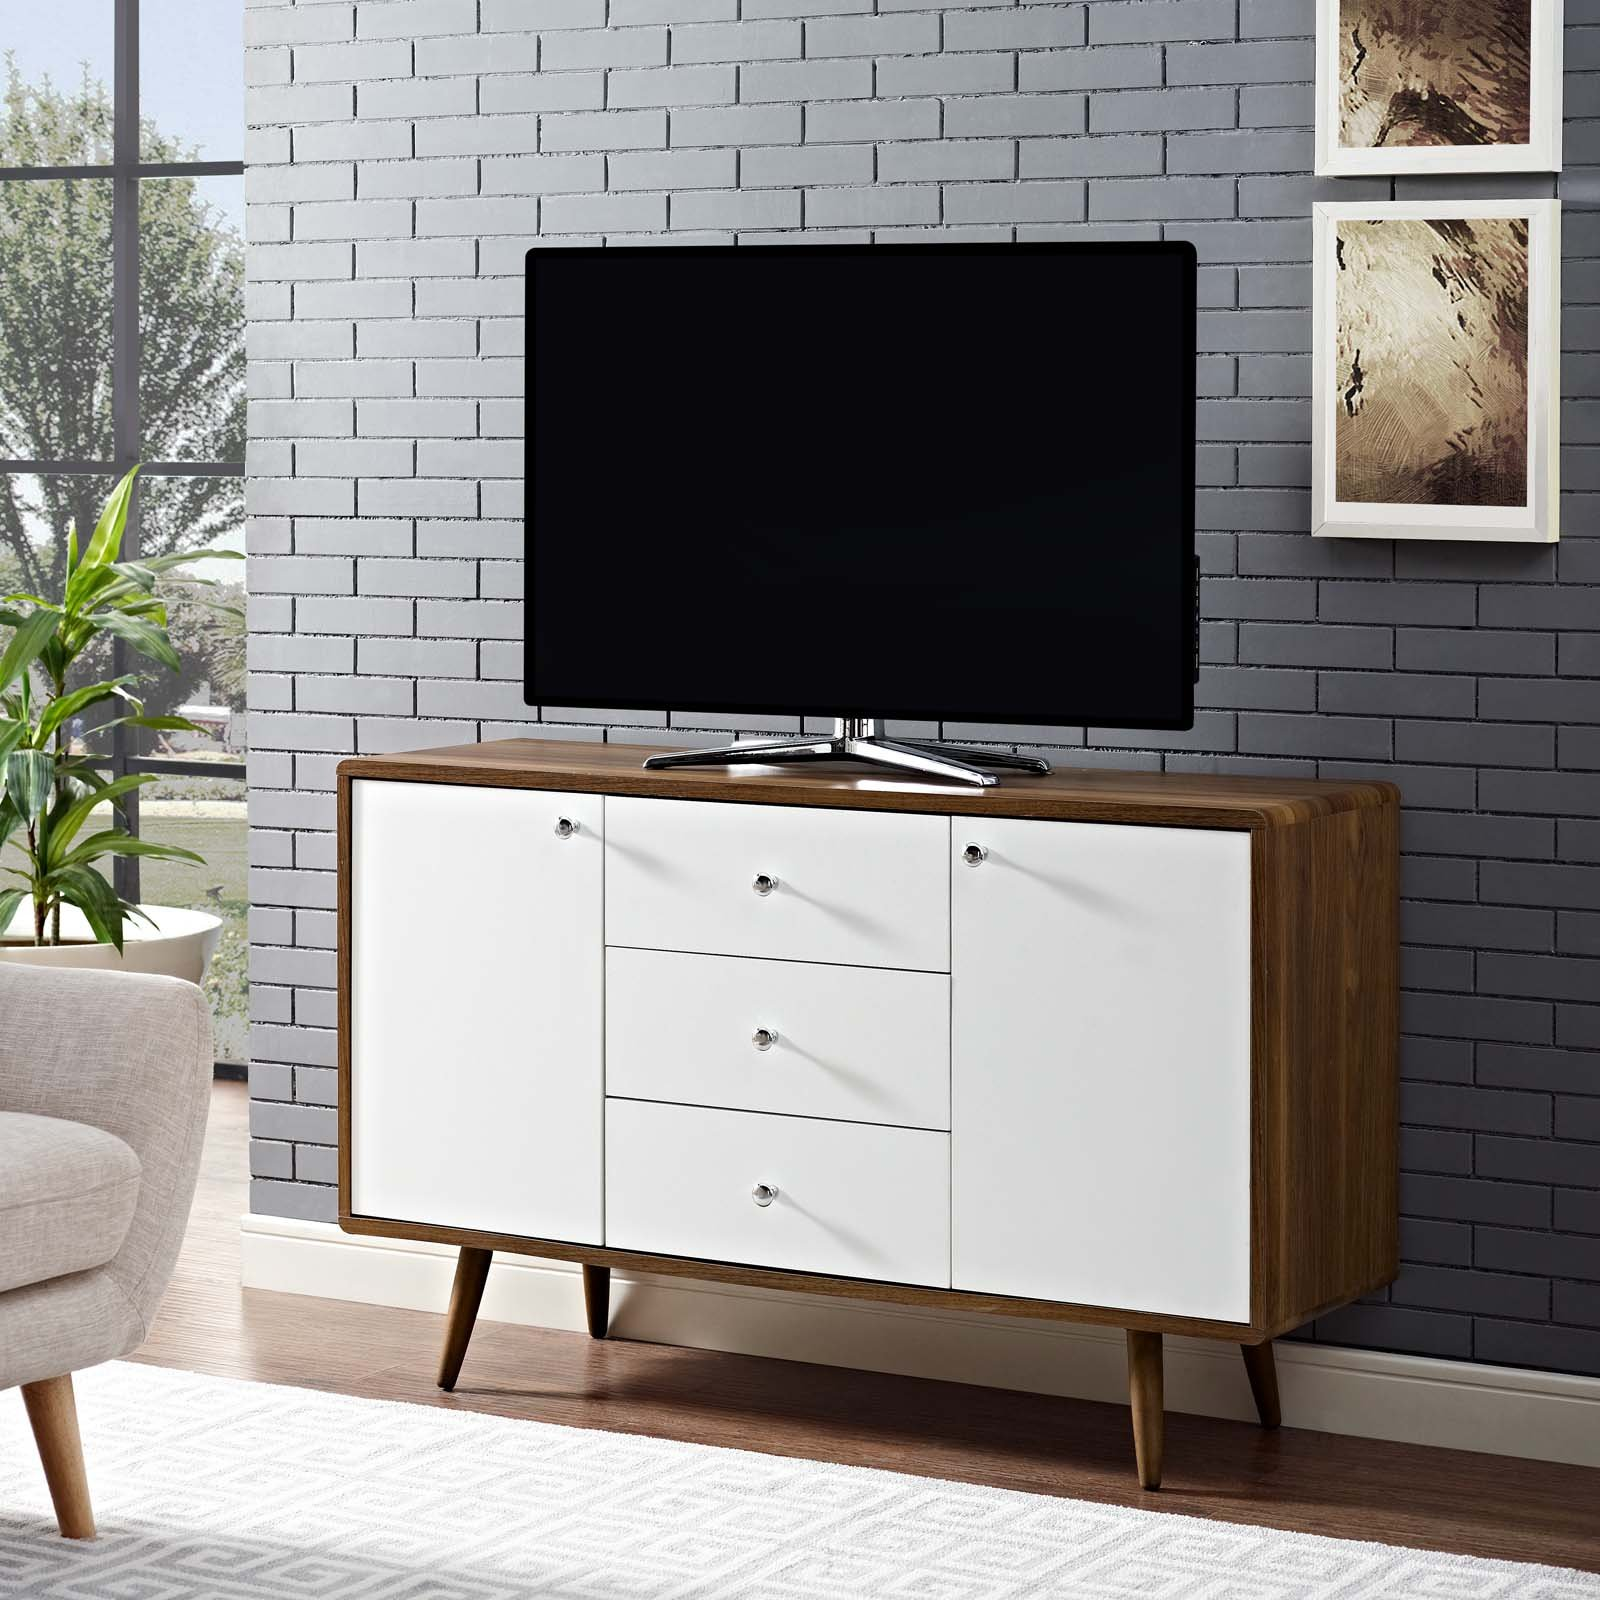 Modern Wood Credenza: Amazon.com on modern desk, modern entertainment center, modern lamp, modern secretary, modern daybed, modern wall unit, modern chaise lounge, modern etagere, modern commode, modern drawers, modern recliner, modern sideboard, modern tv,